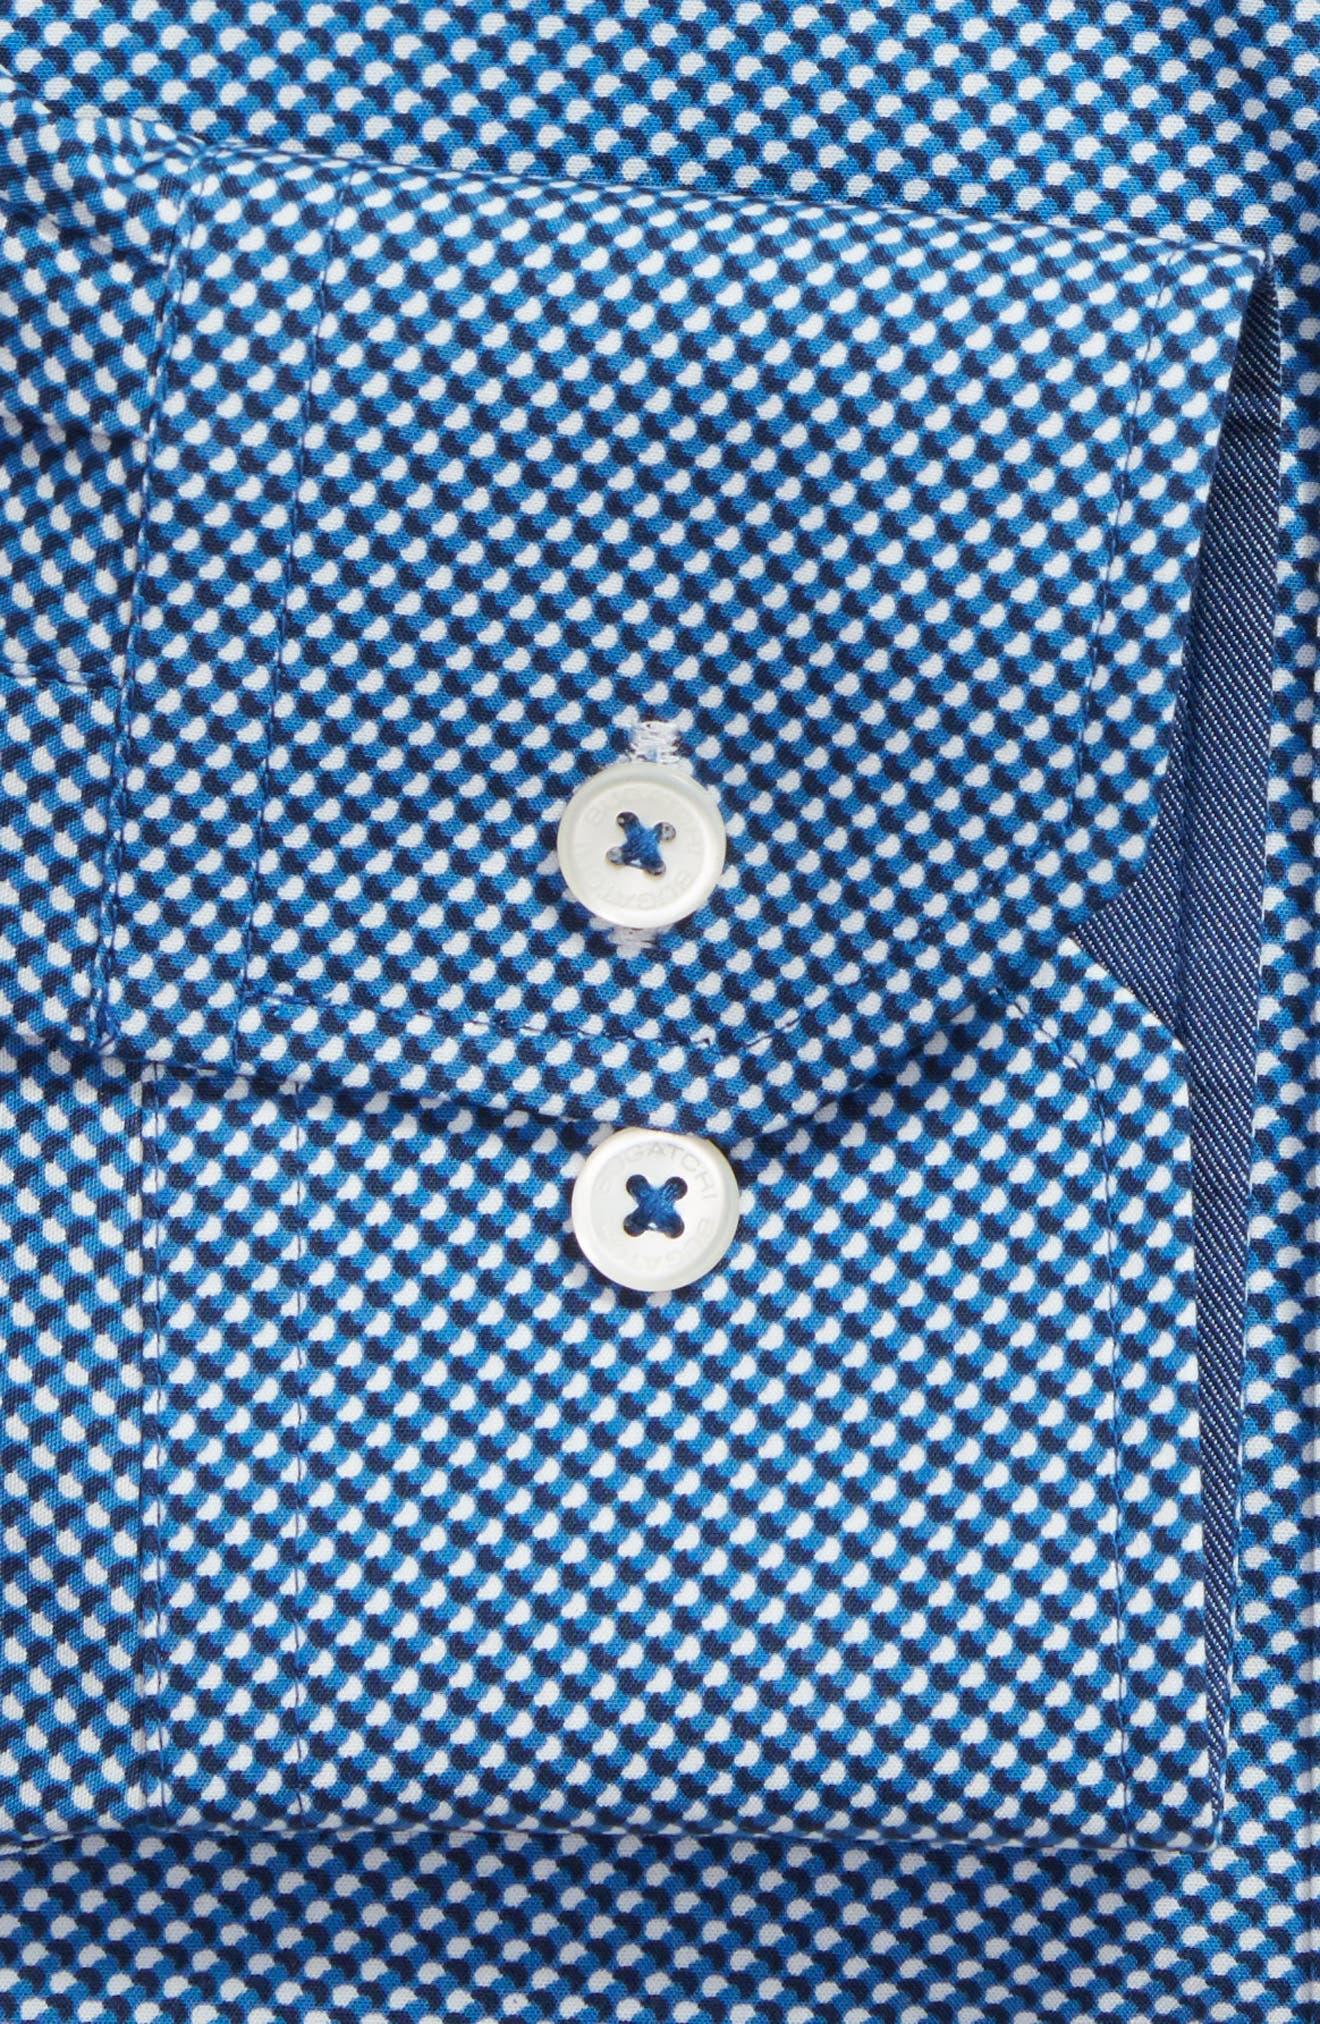 Alternate Image 2  - Bugatchi Trim Fit Print Dress Shirt